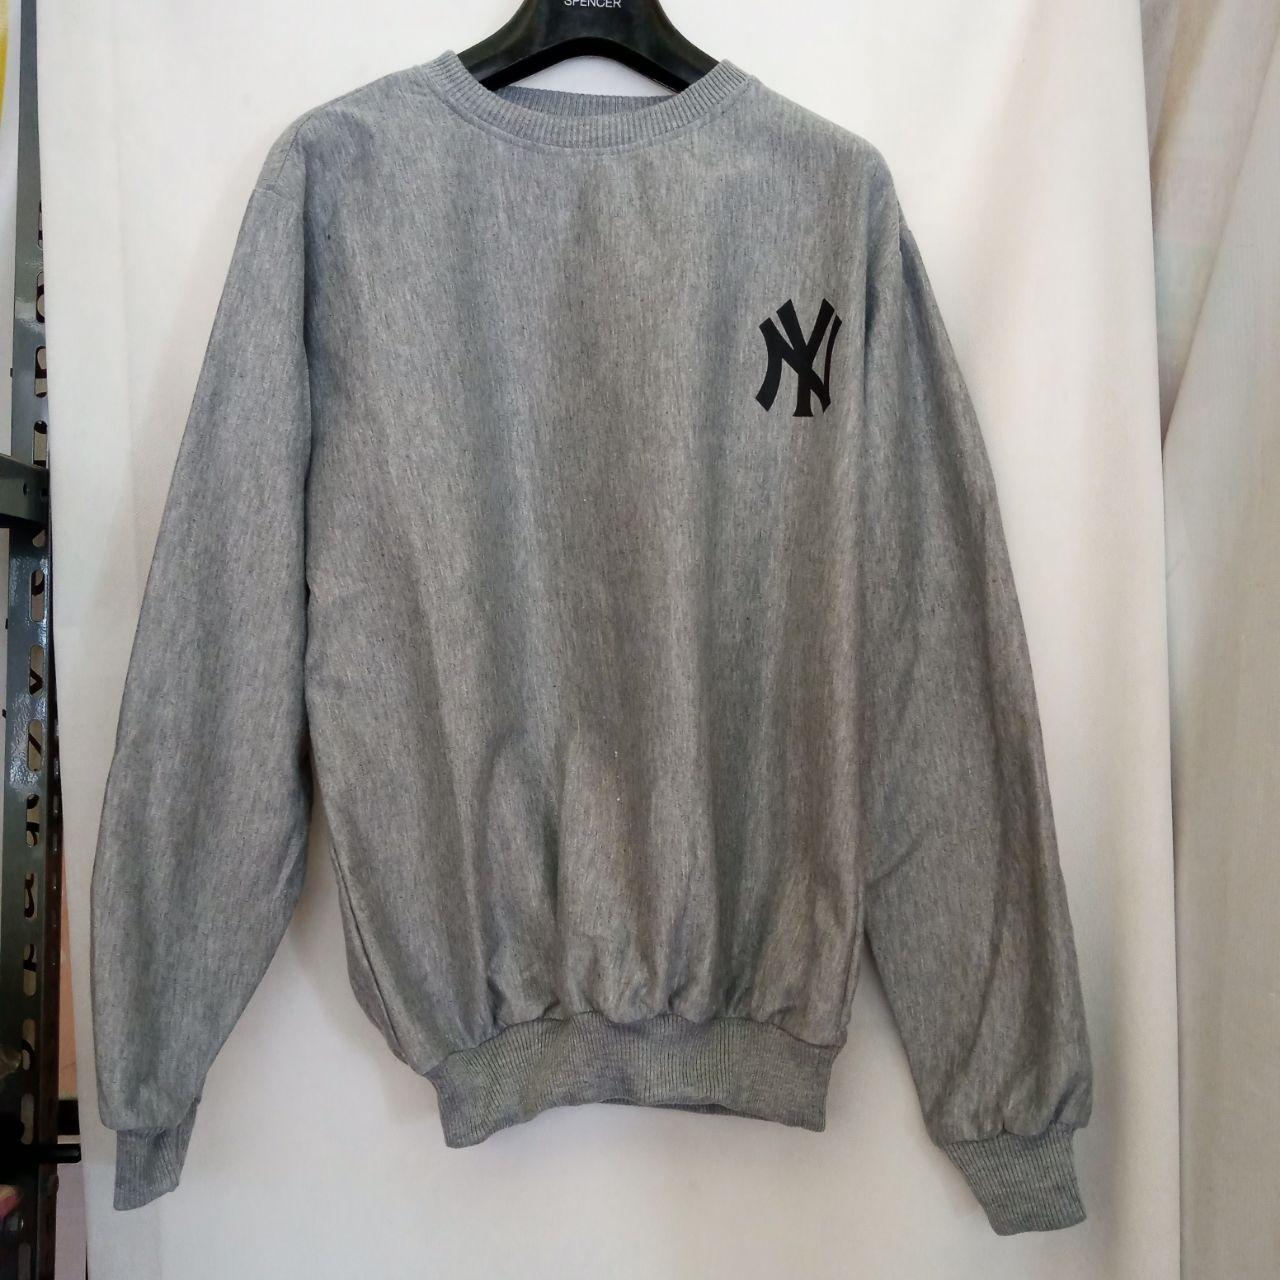 ini adalah Sweater NY2 Abu, size: LD 90cm, Panjang 60cm, material: Fleece, color: Grey, brand: jaketindonesia, age_group: all ages, gender: unisex